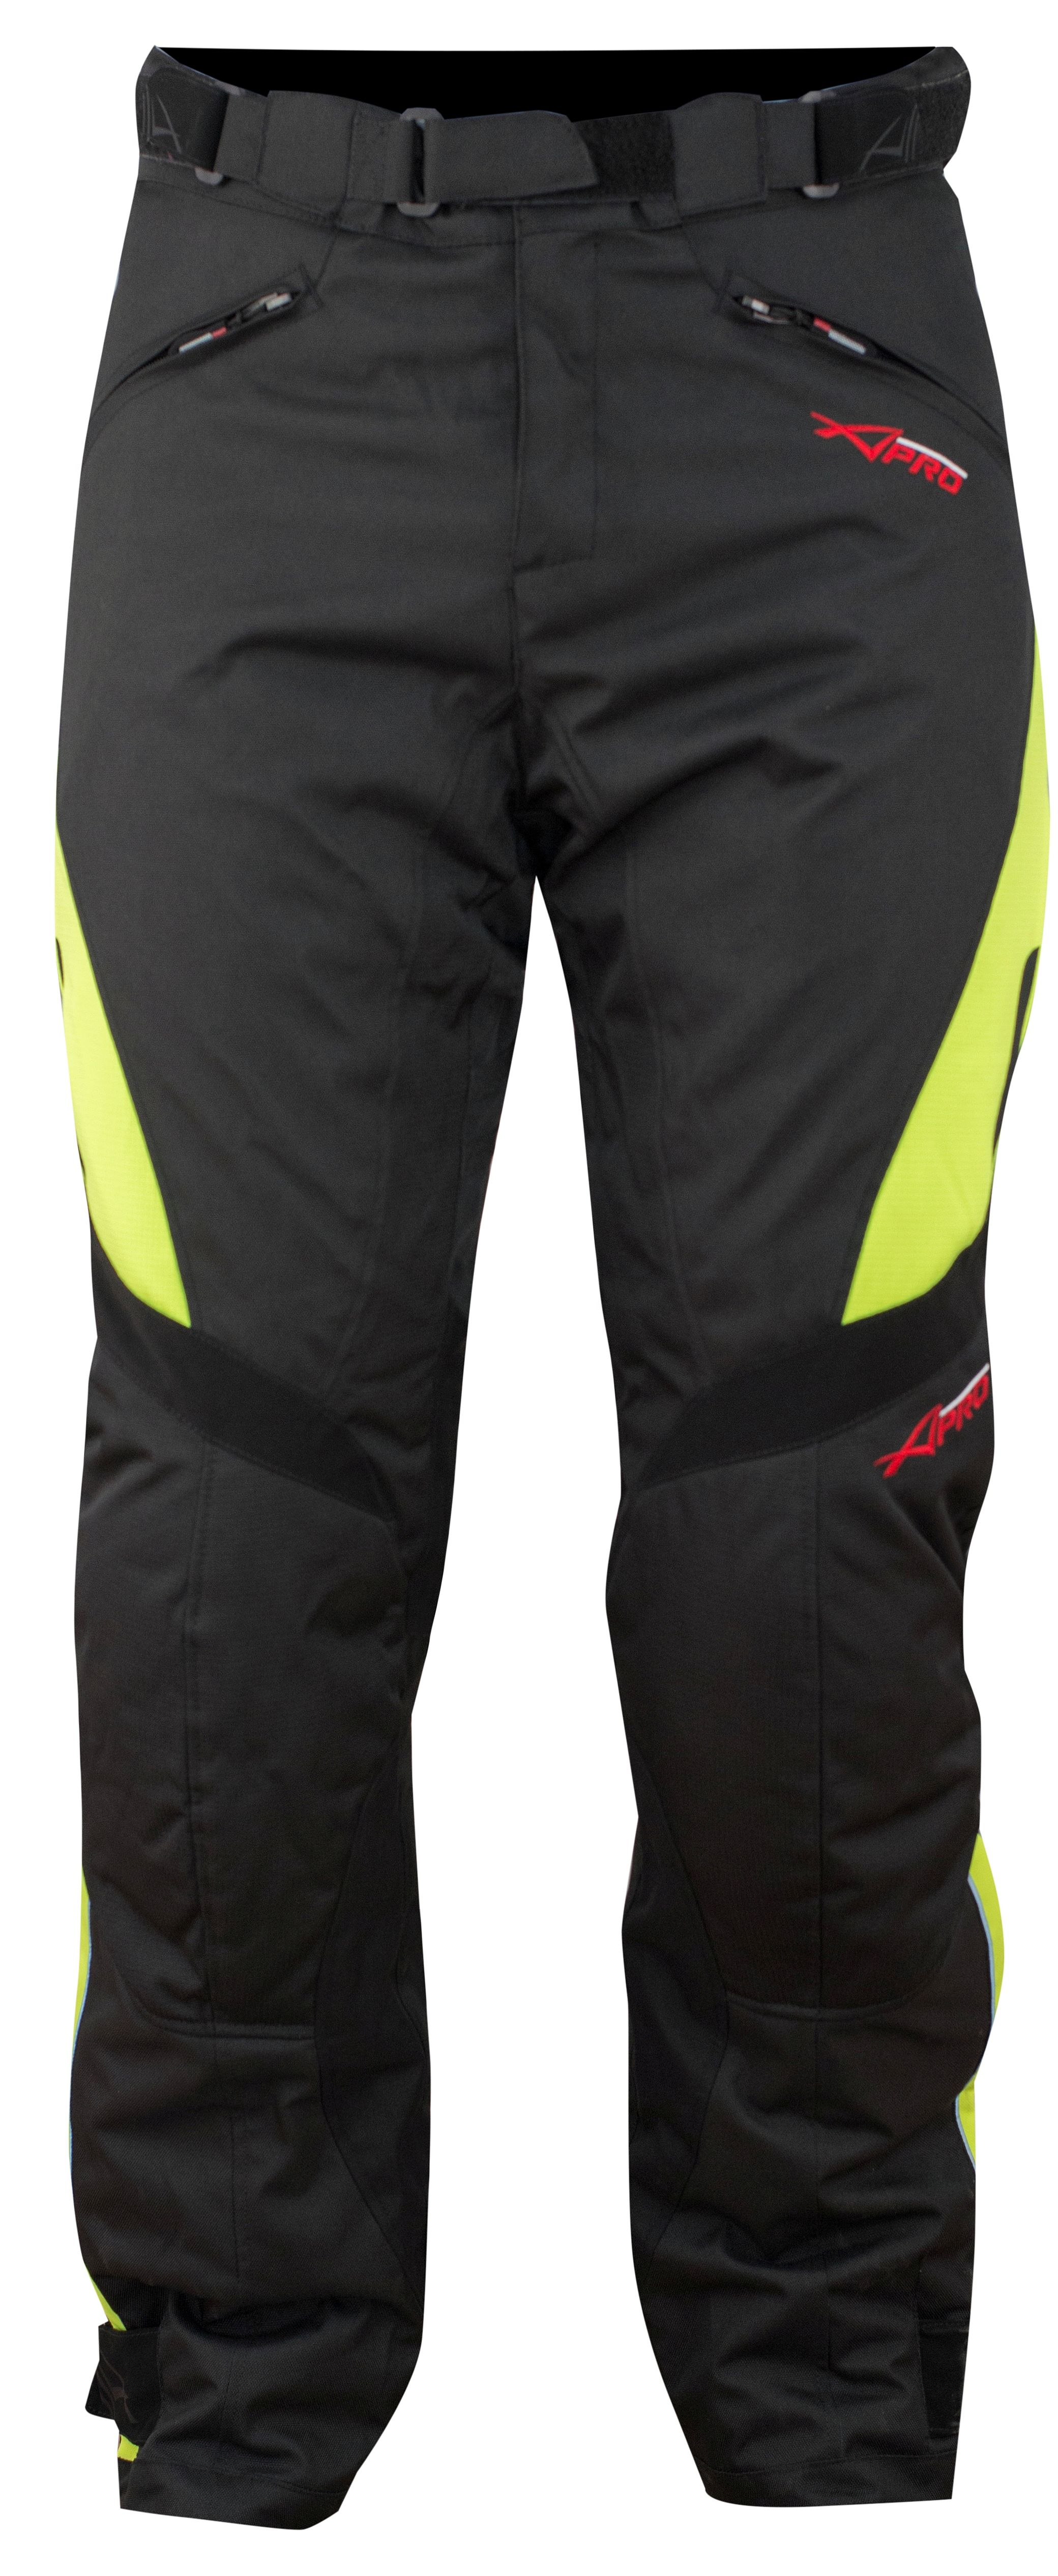 Pantaloni-Donna-Impermeabile-Moto-Imbottitura-Termica-Traspirante-Fluo miniatura 9